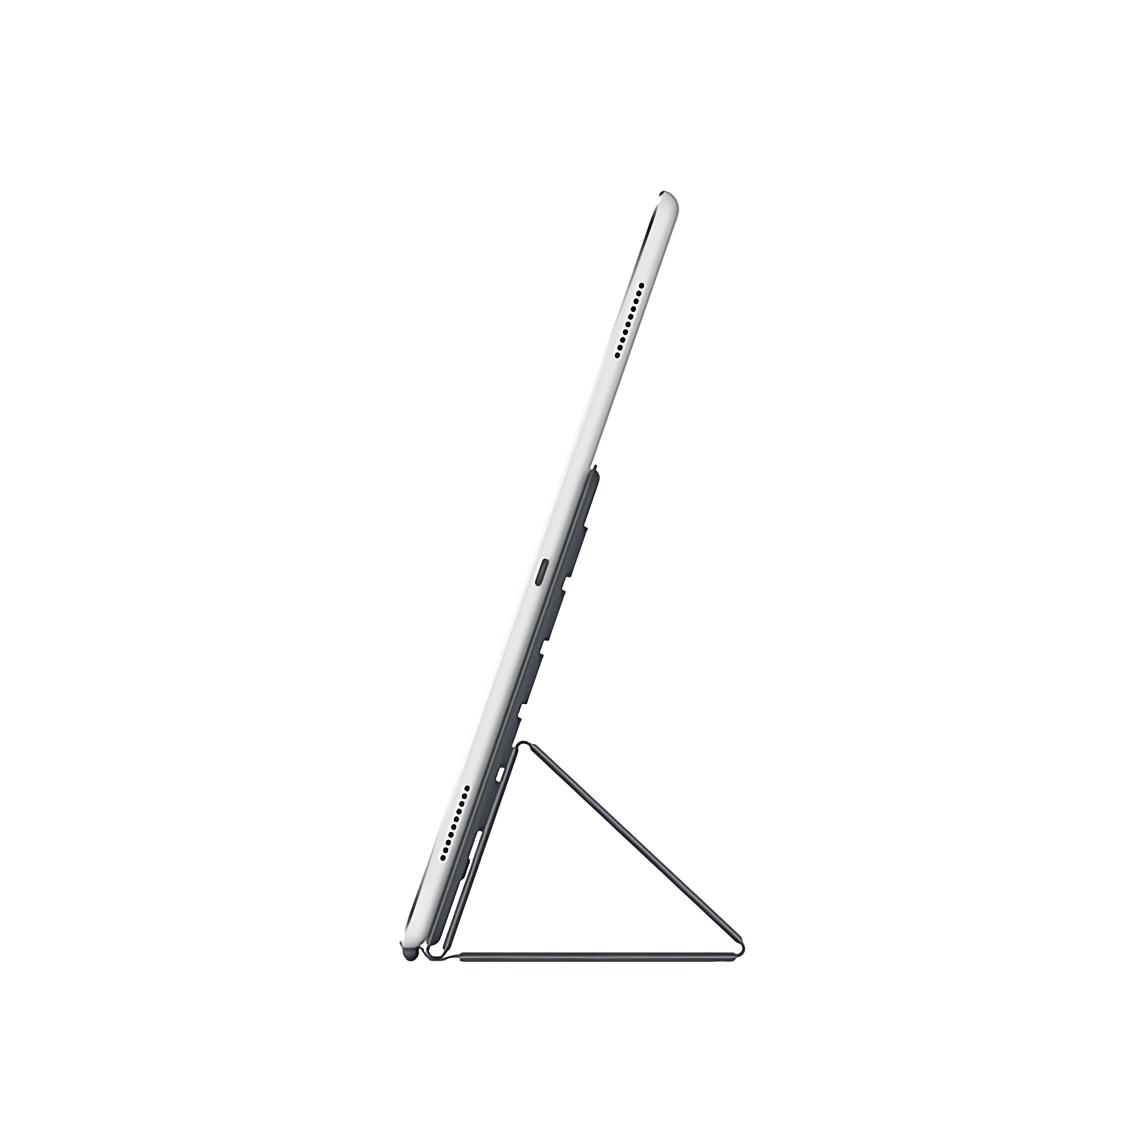 ★每月4 / 14 / 24號 點數三倍★ Apple Smart Keyboard for 12.9吋 iPad Pro (美式英文) 佳成數位 2